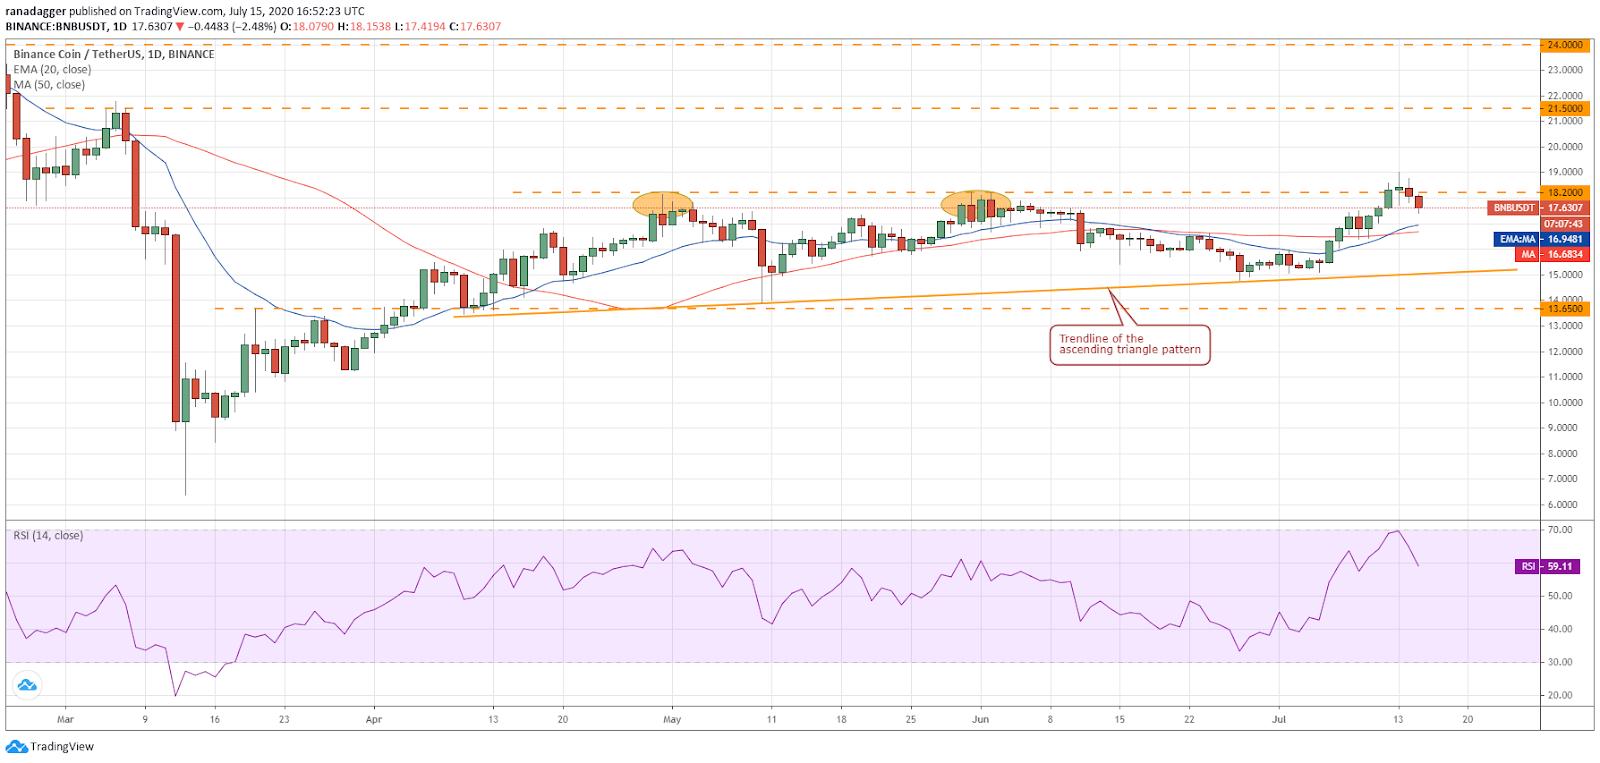 BNB/USD daily chart